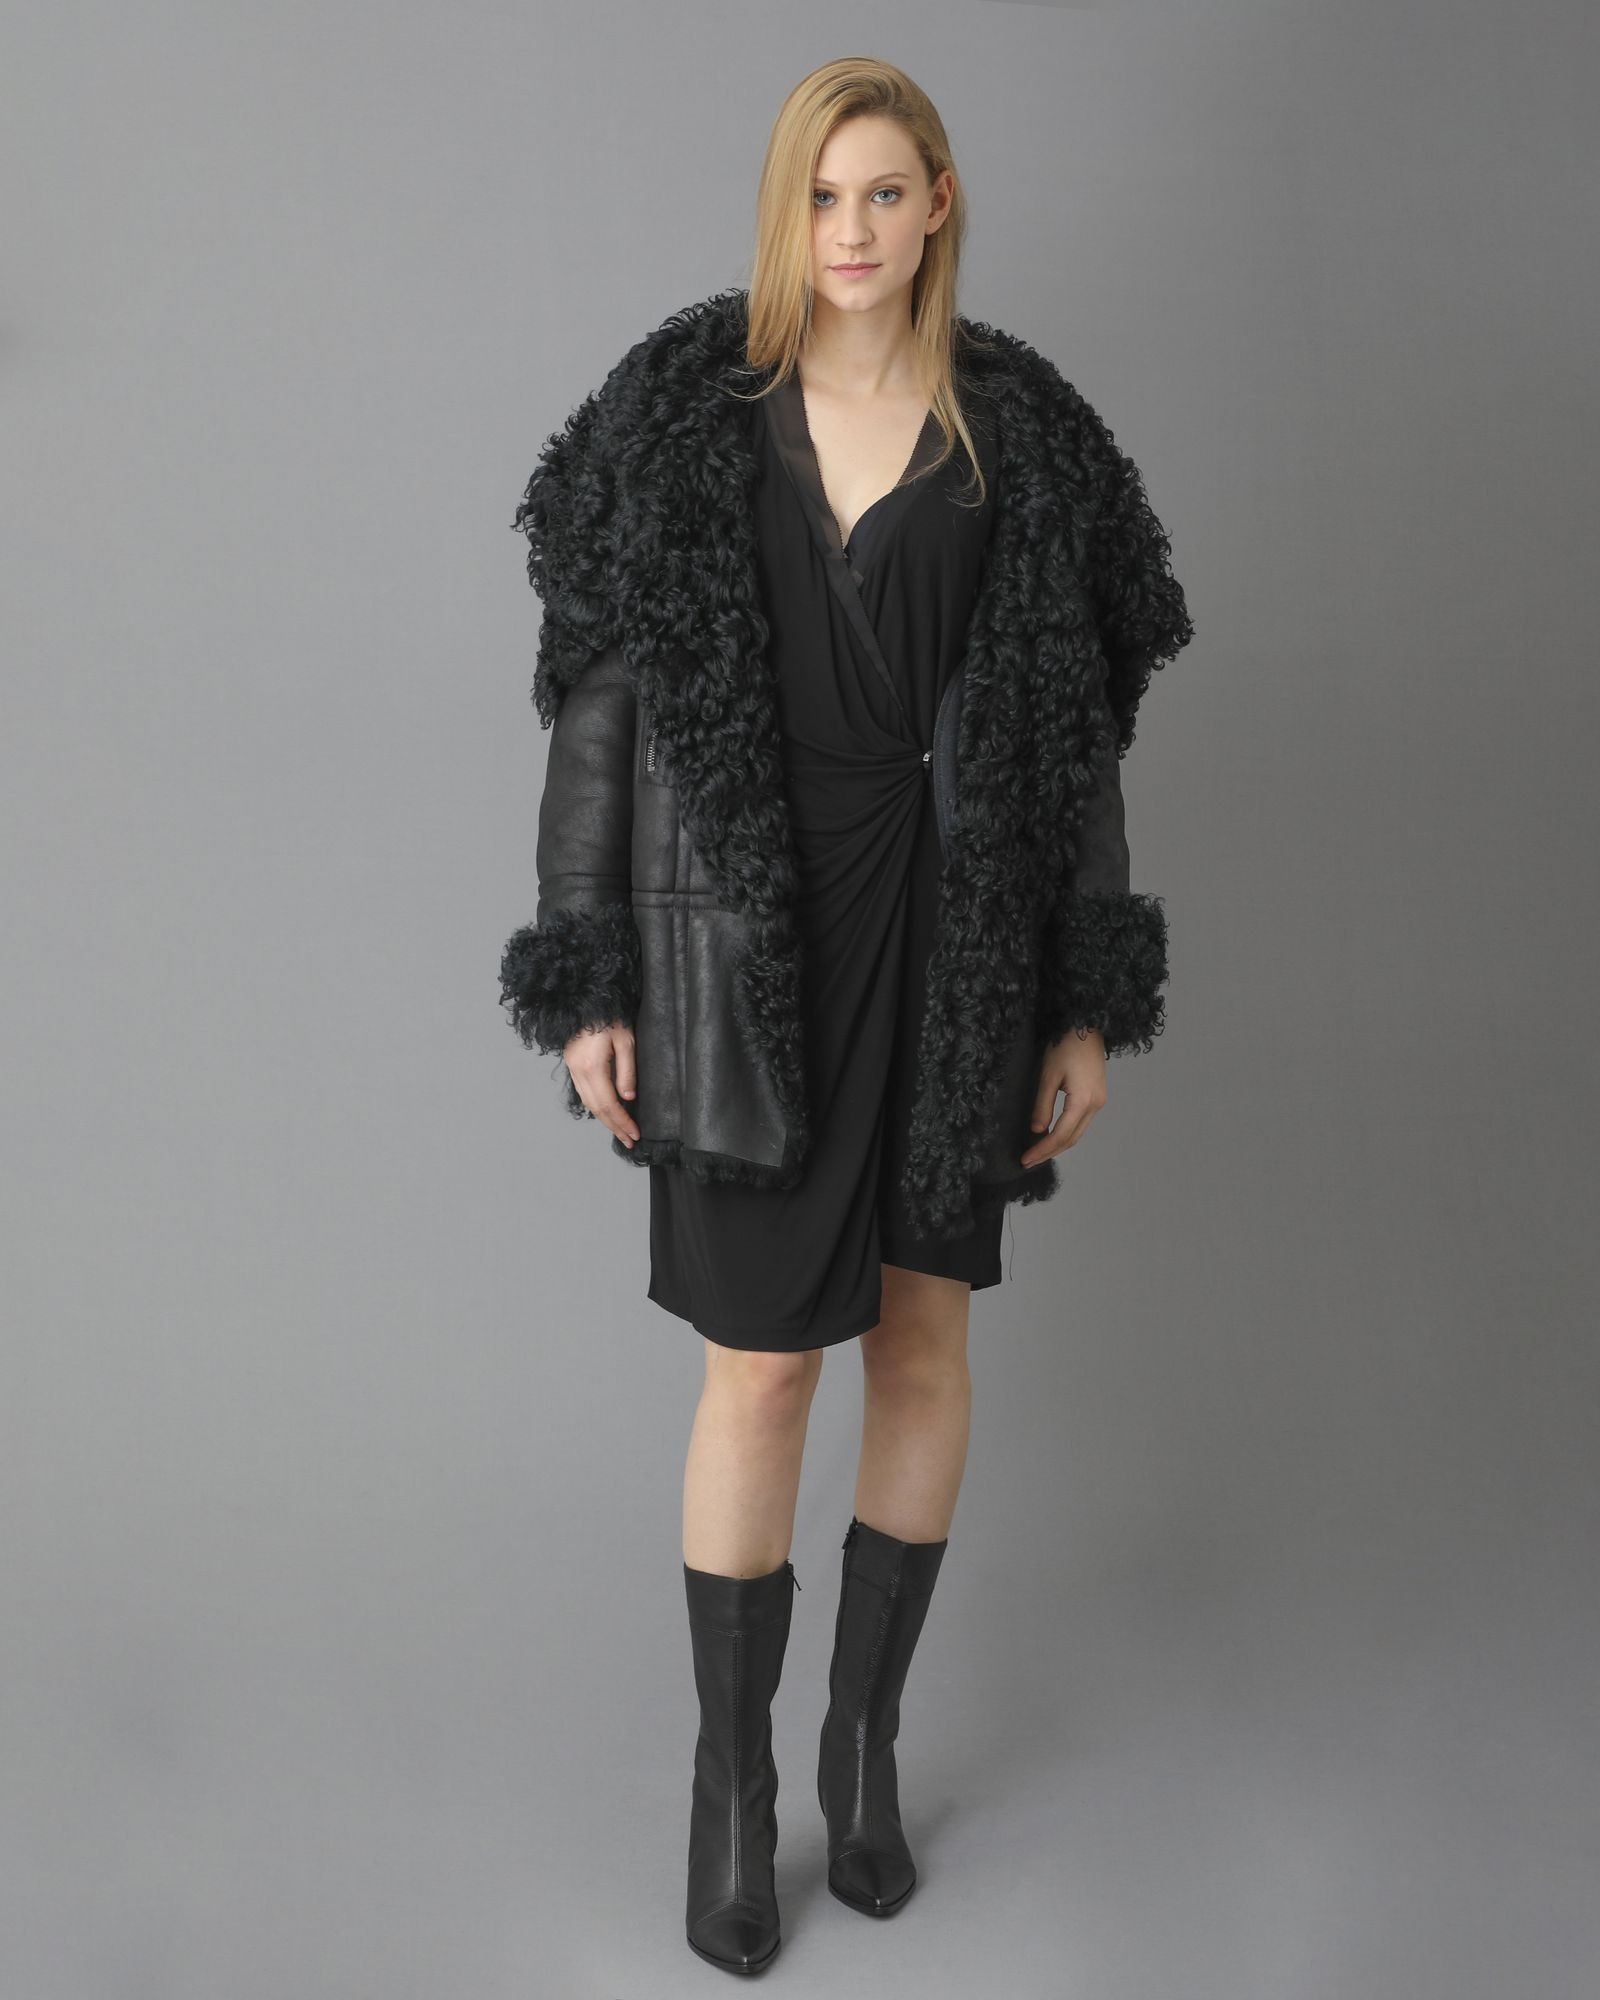 Robe noire Emanuel Ungaro